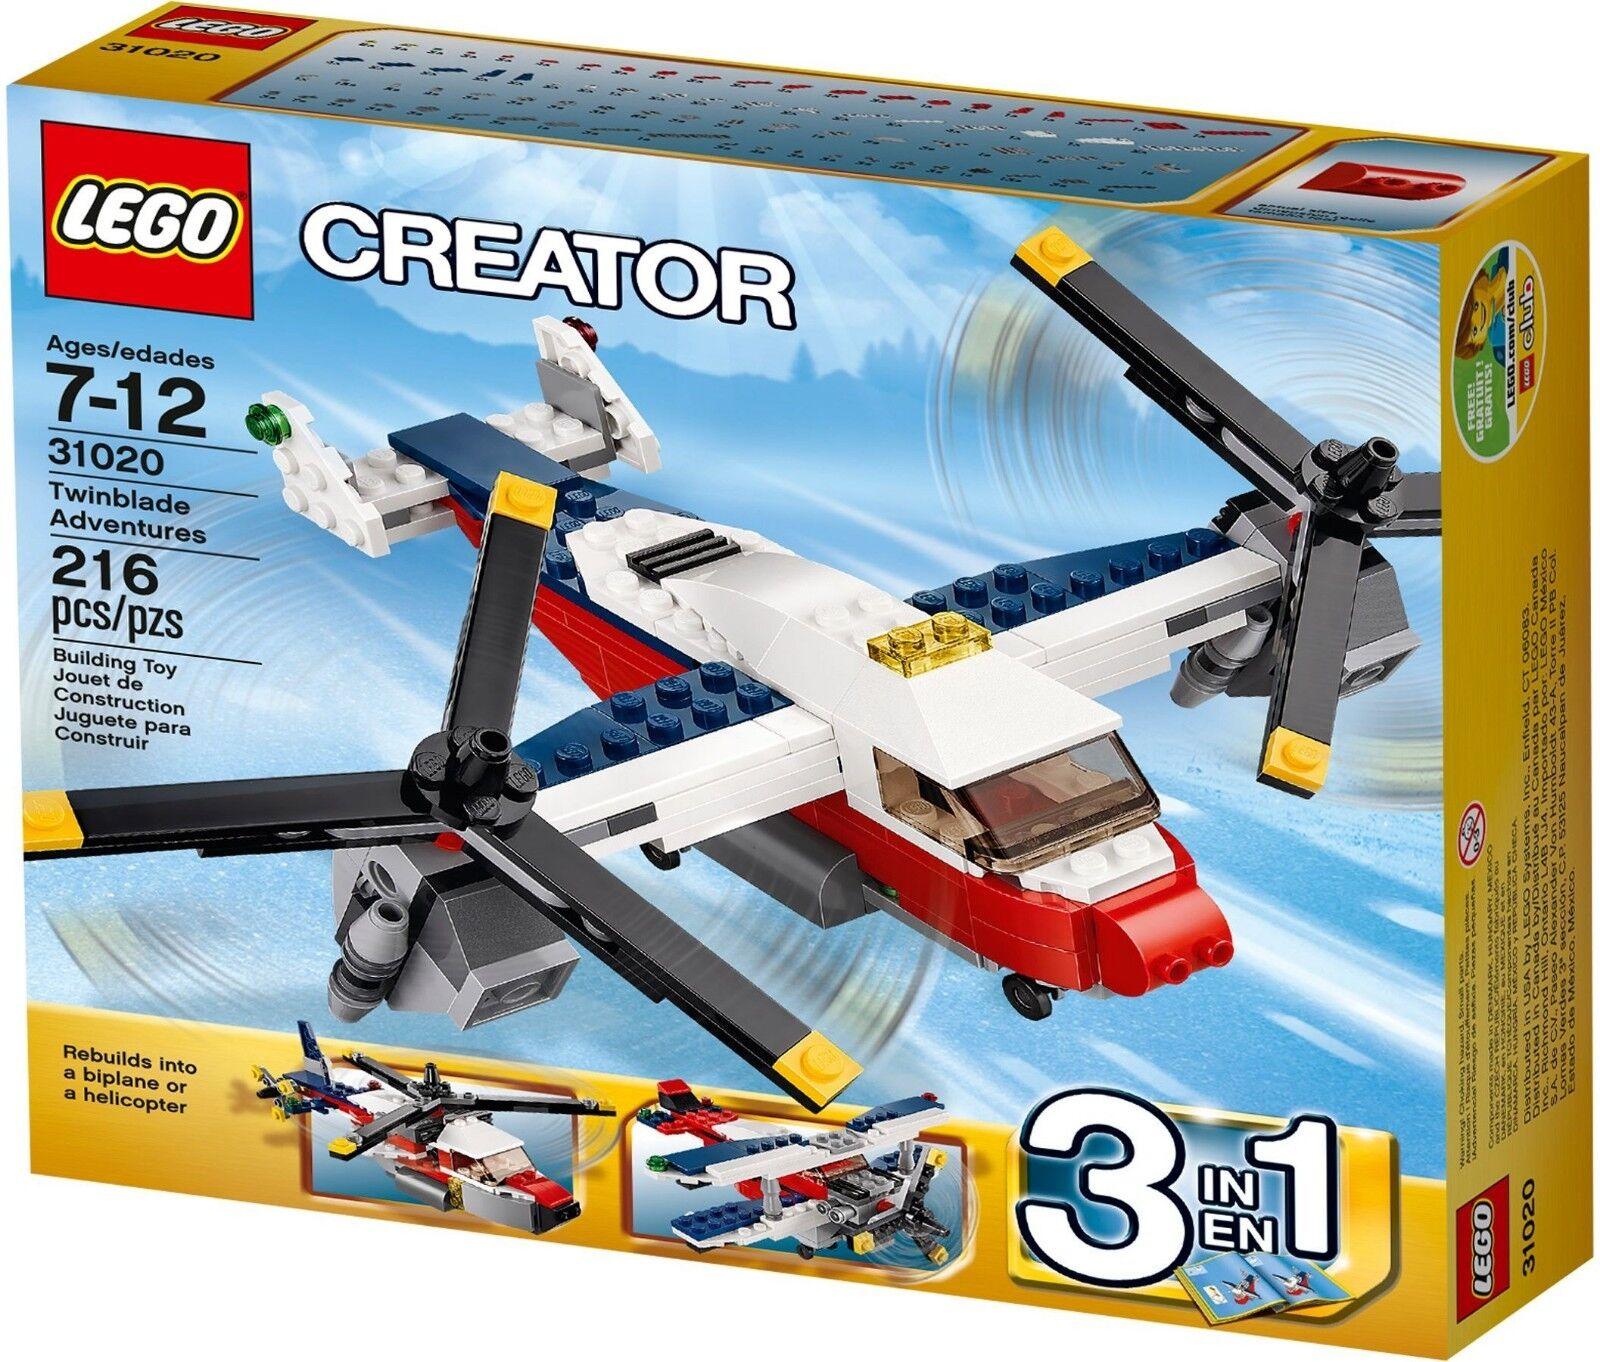 BNIB Genuine Lego Creator 31020 Twinblade Adventures Lego plane helicopter